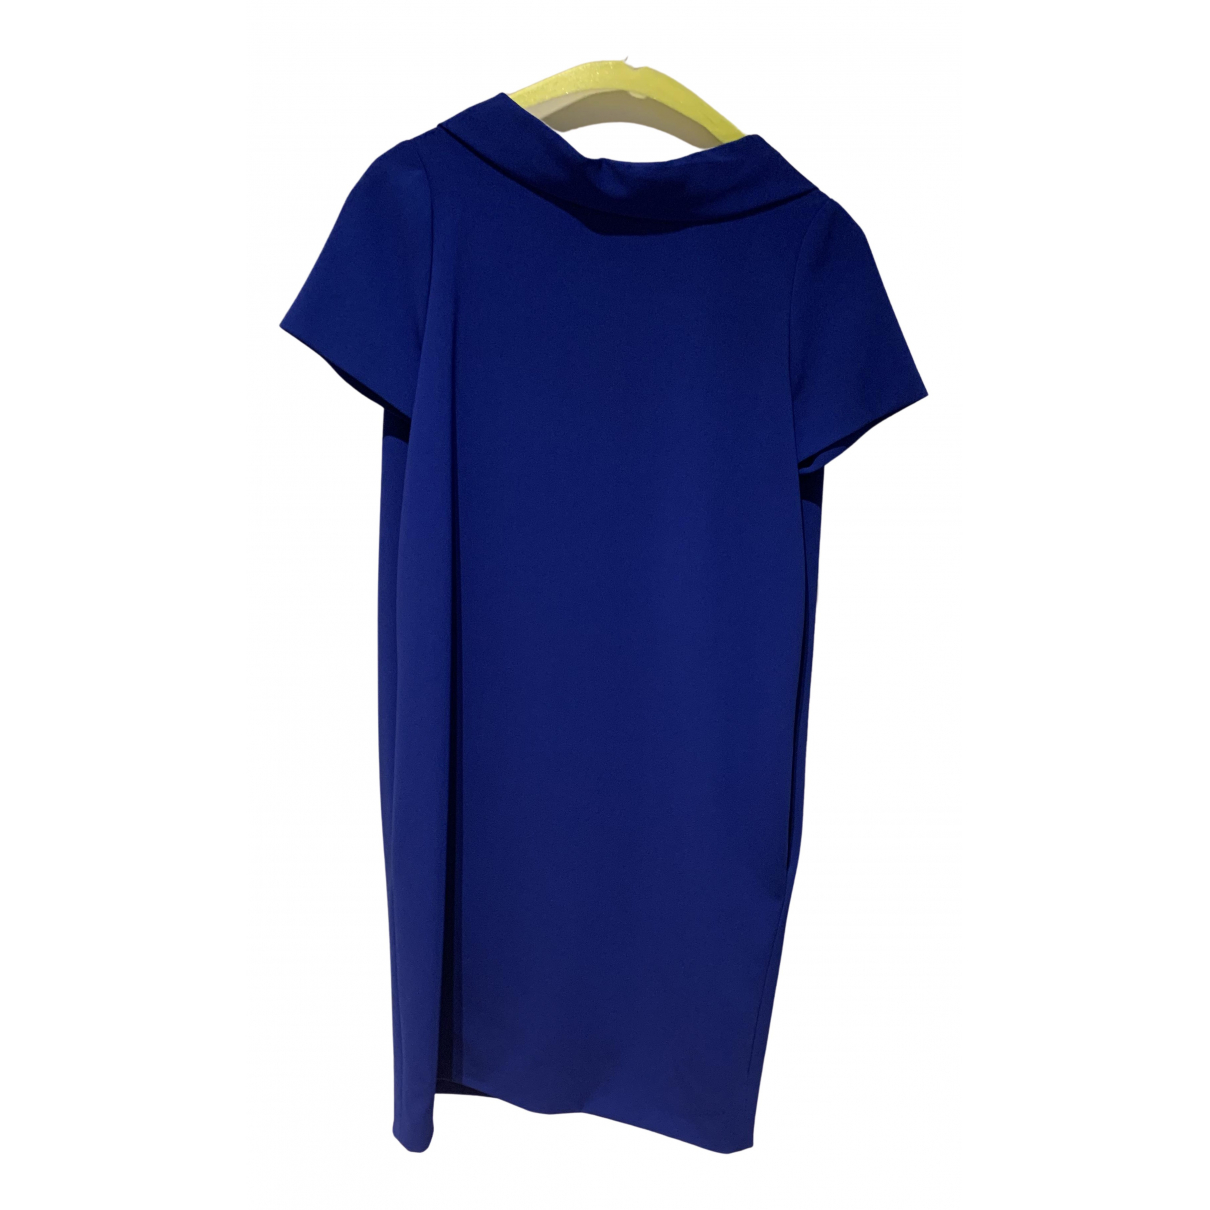 Moschino \N Kleid in  Blau Polyester